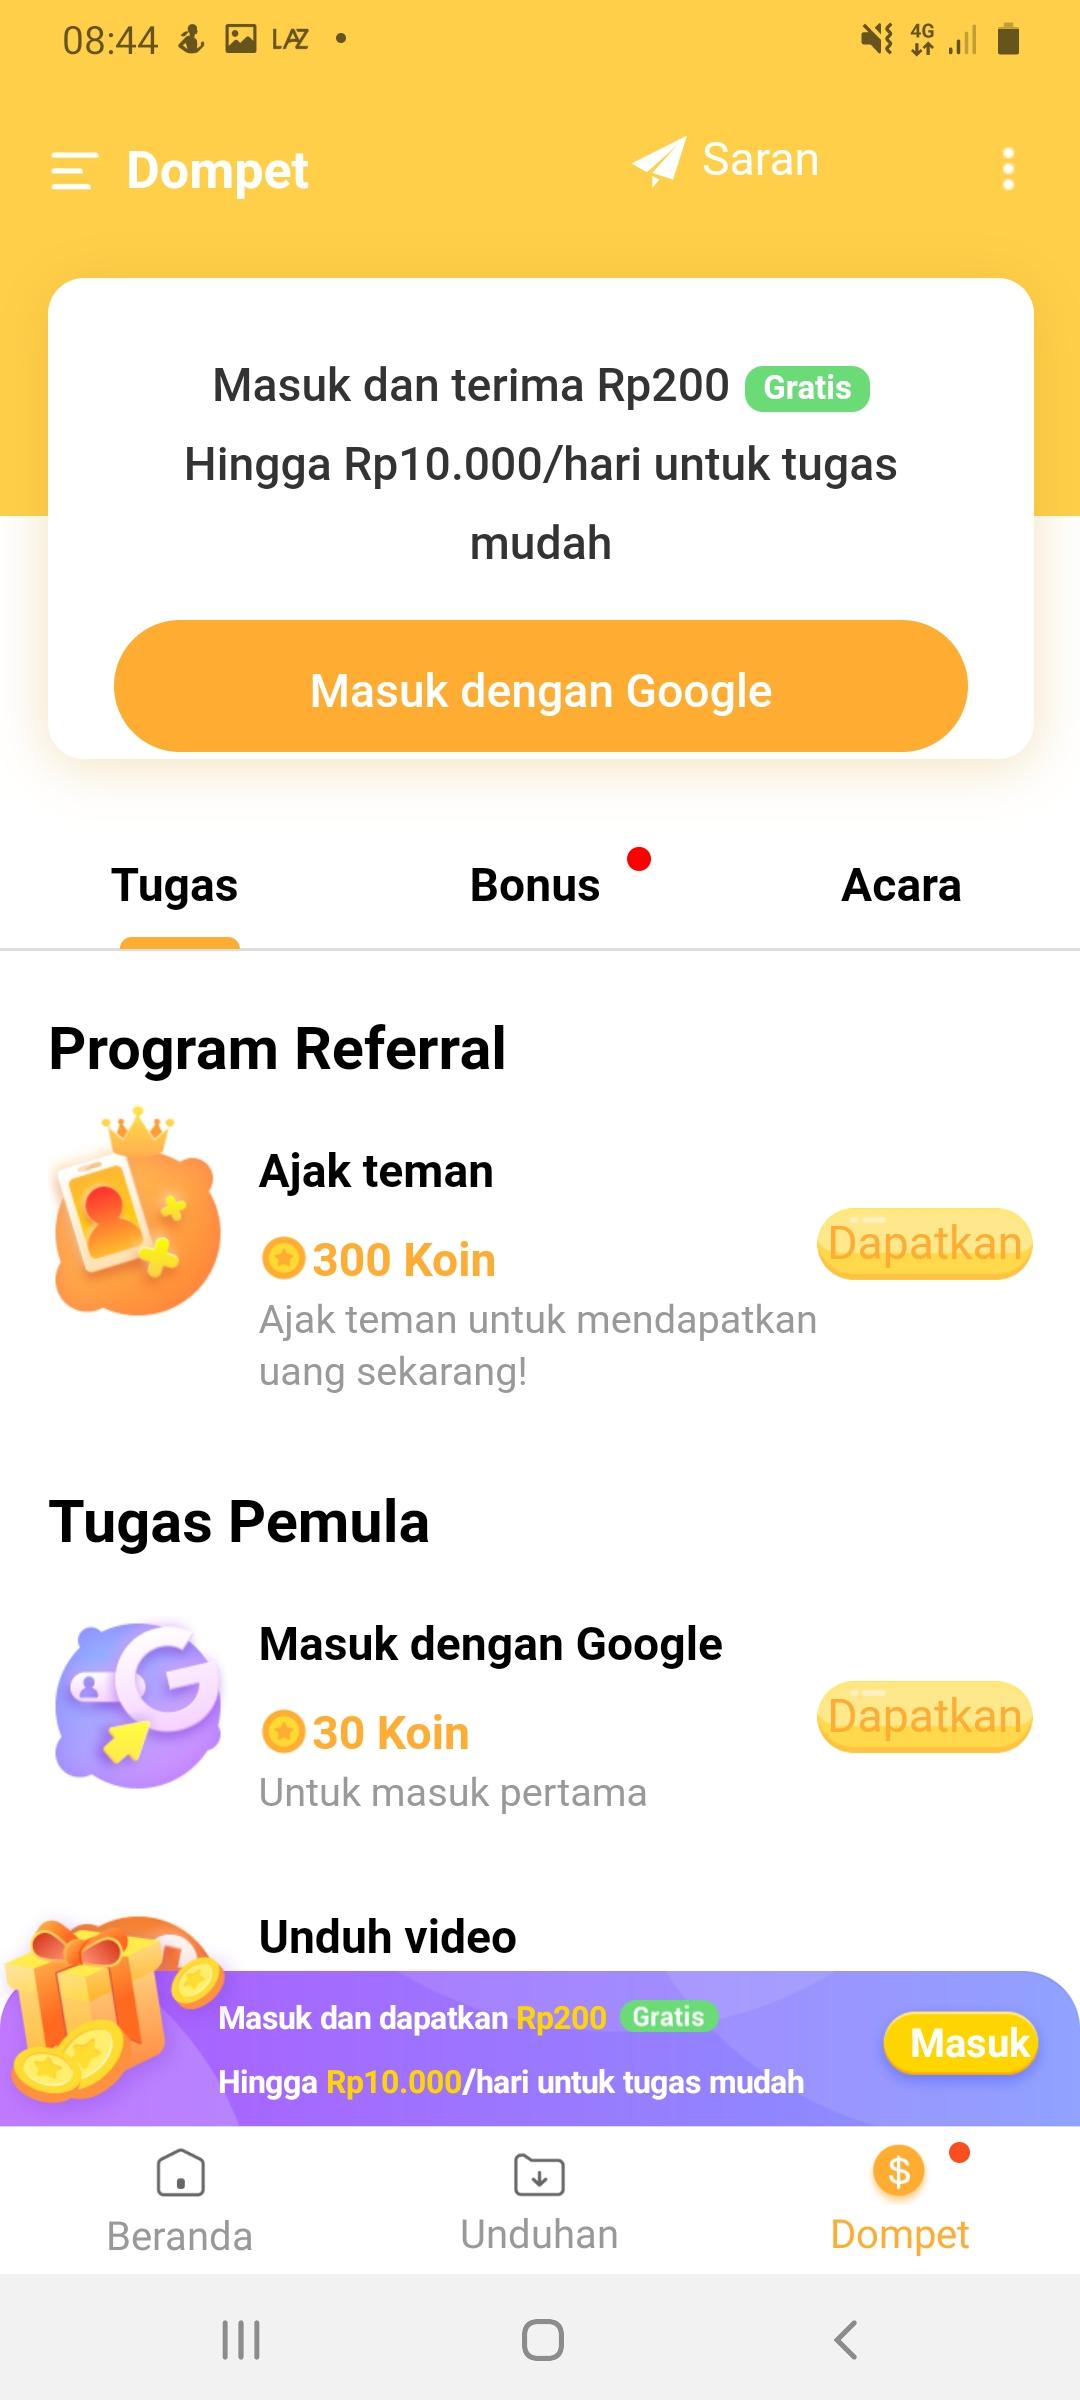 Vidnow Aplikasi Penghasil Saldo Dana Gratis 2021 Majalahkece Id